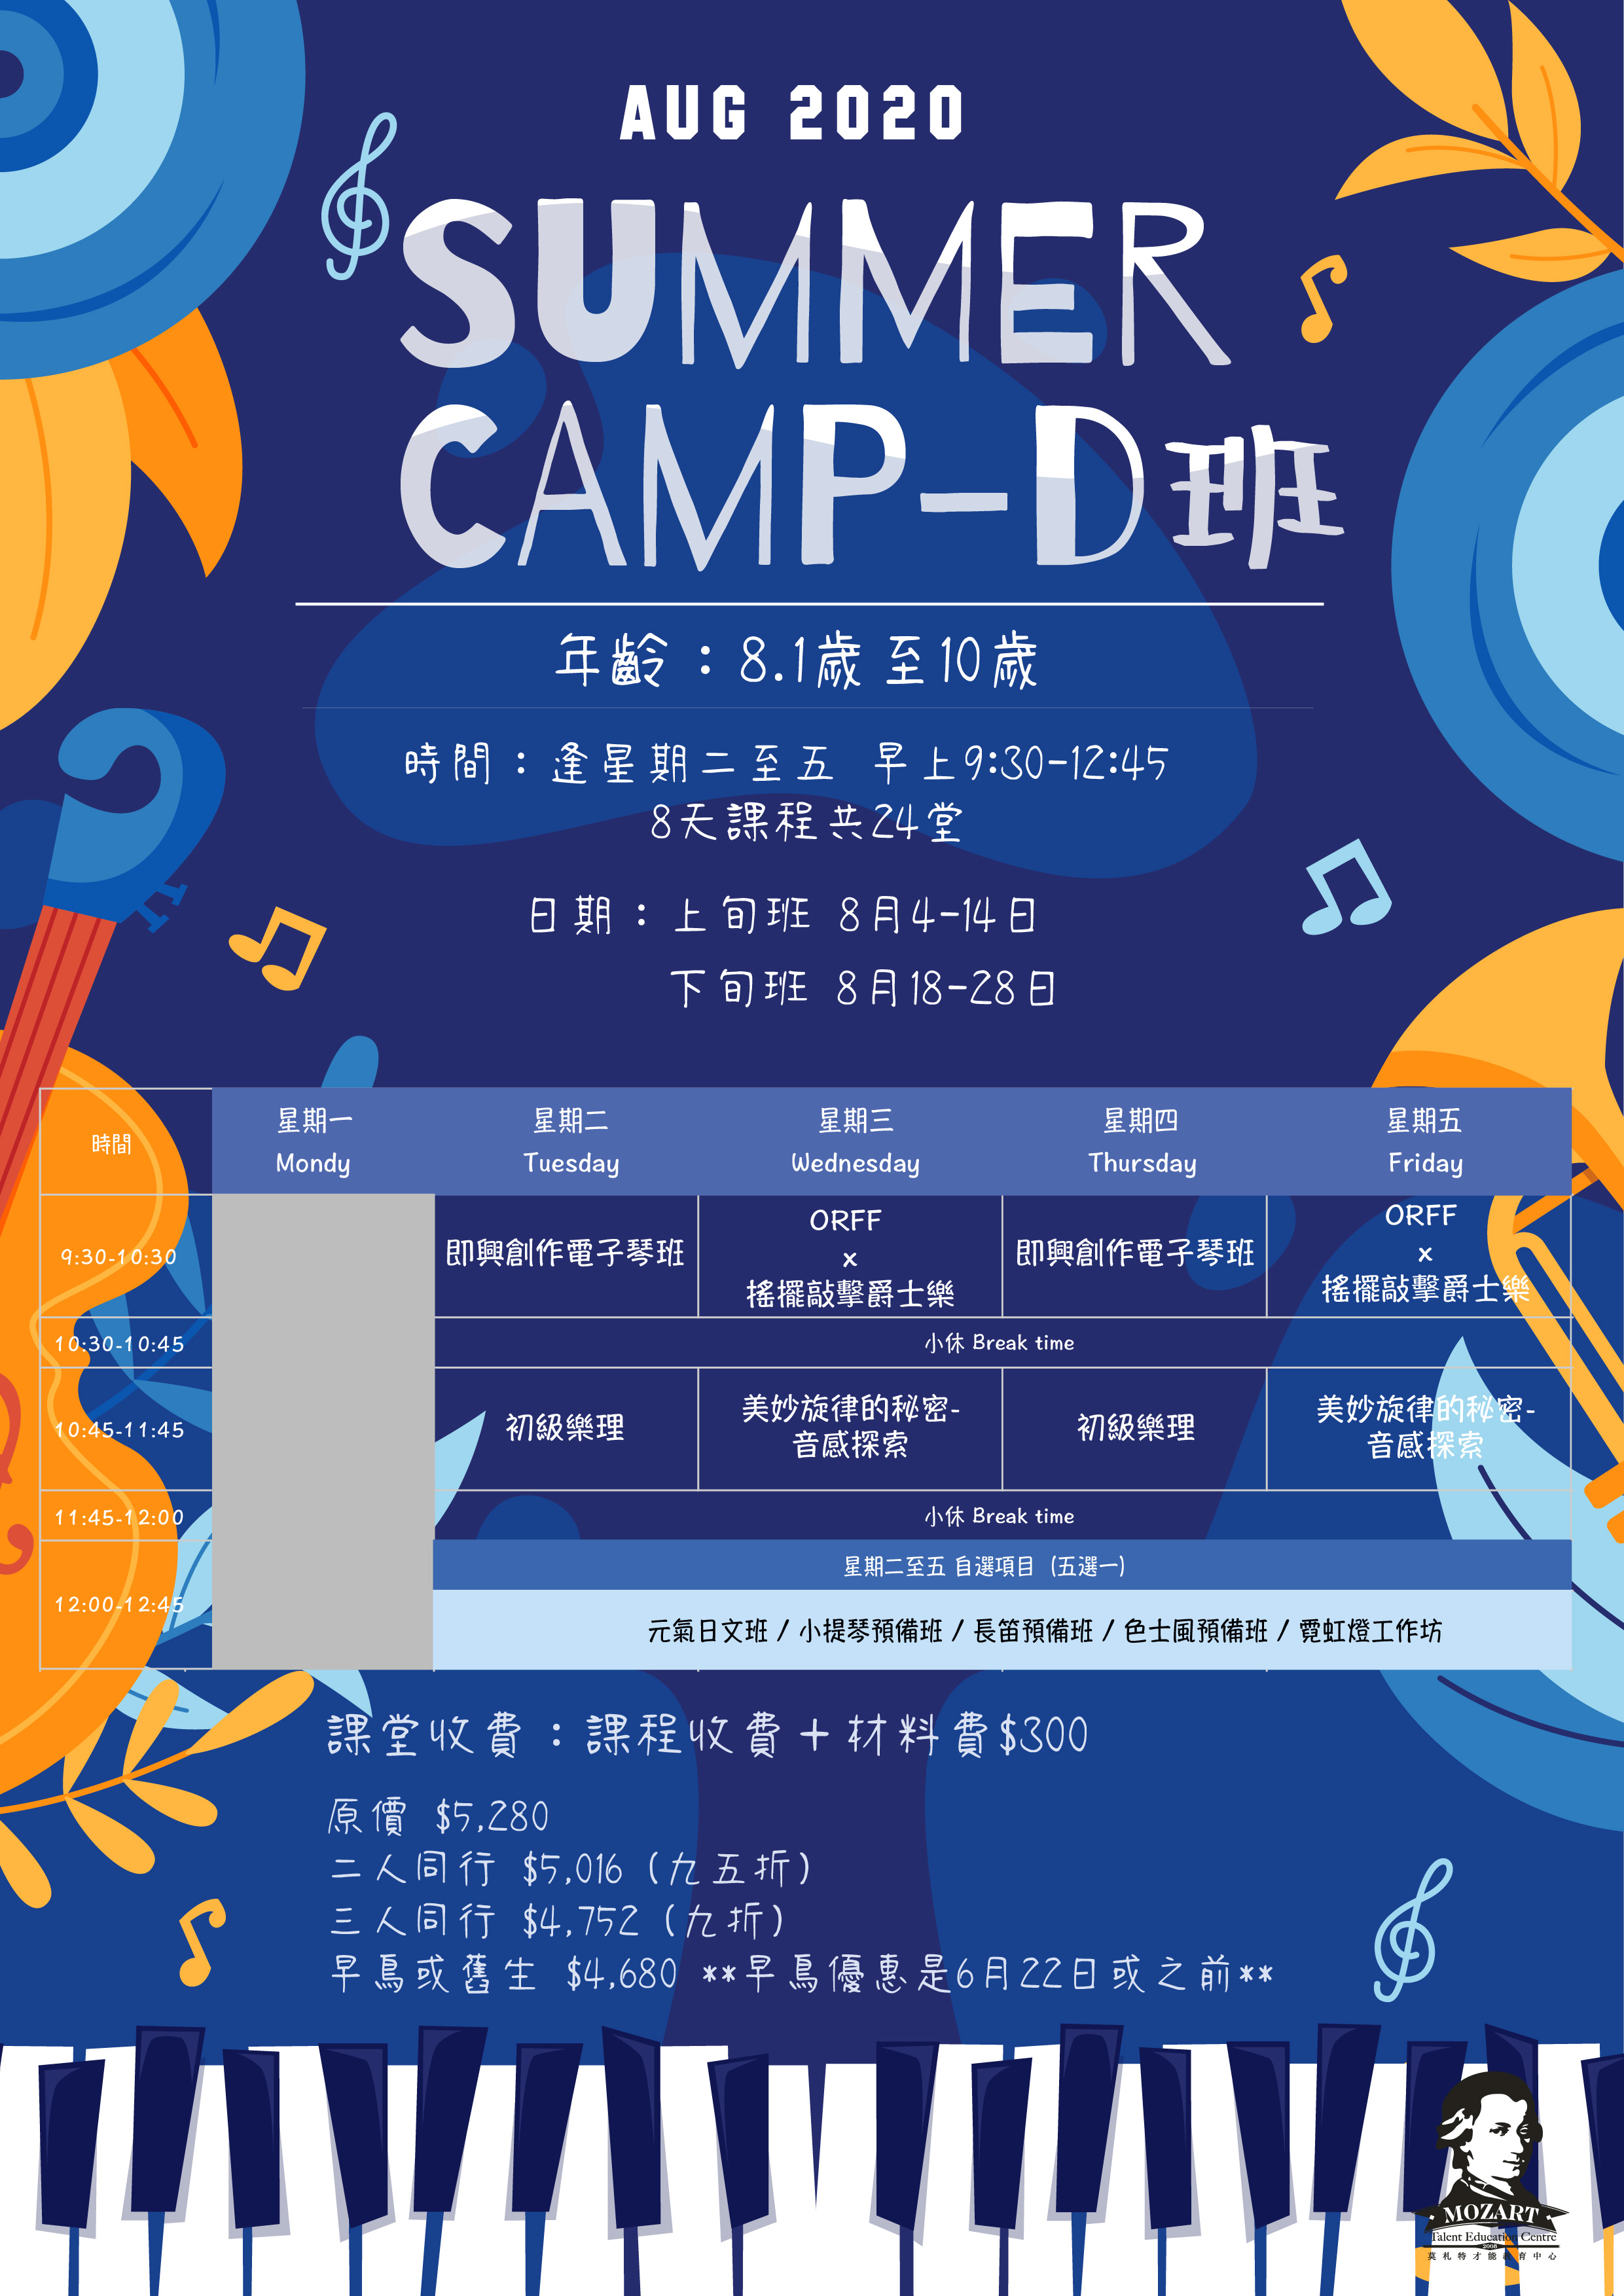 Summer Camp暑期班D班(8.1歲至10歲)